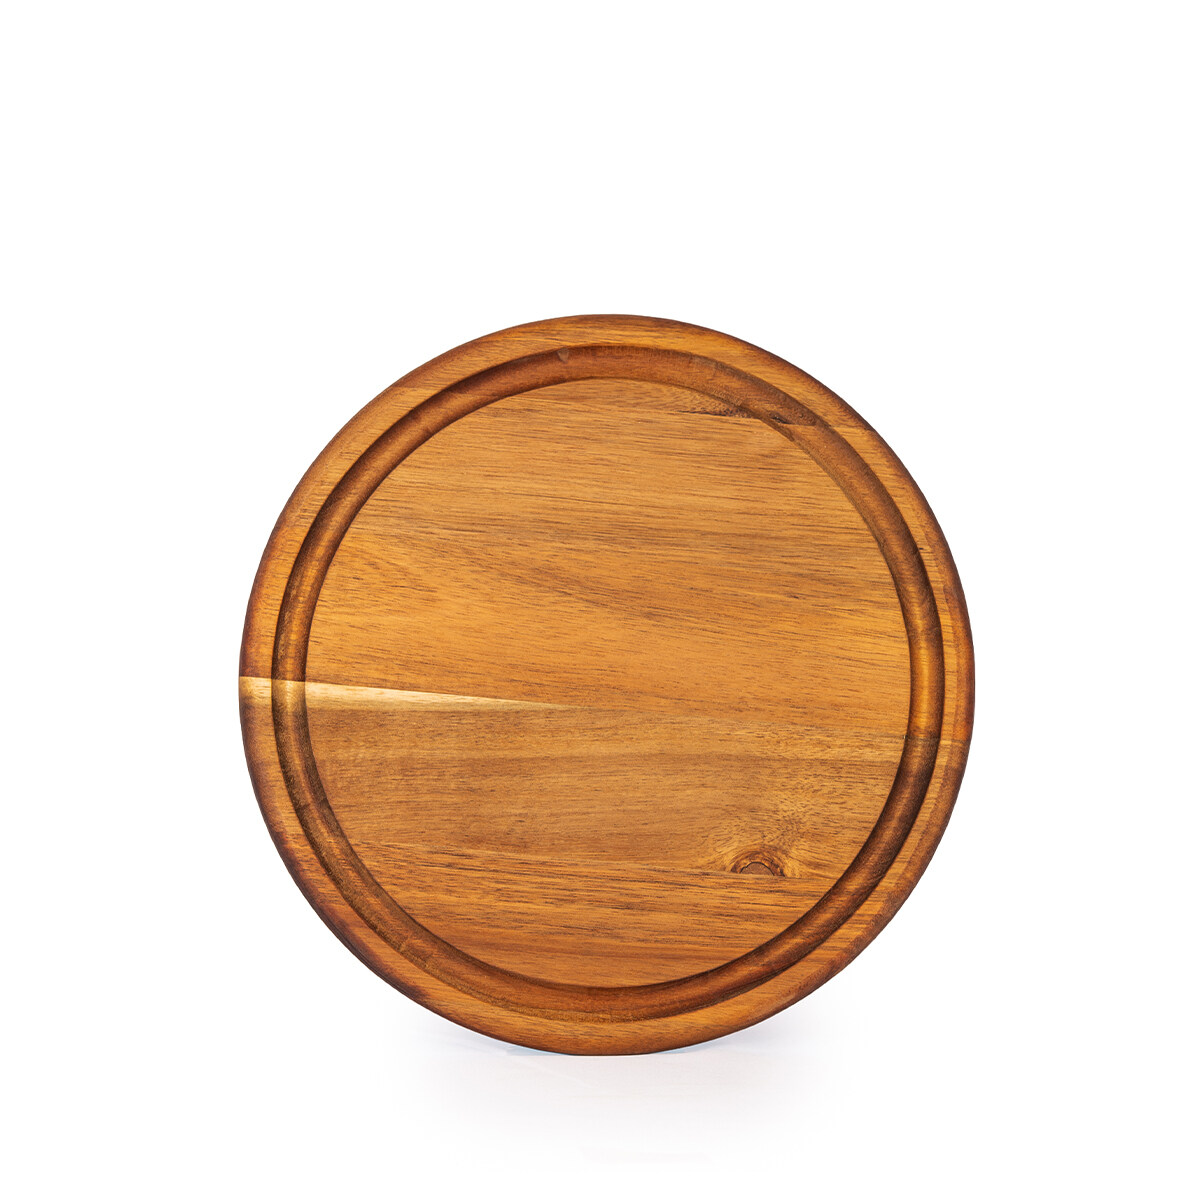 AIDEAS Cutting Board- GOSTOSA serving / chopping / wood / natural / platter / plate / acacia / dessert / coffee / dinner